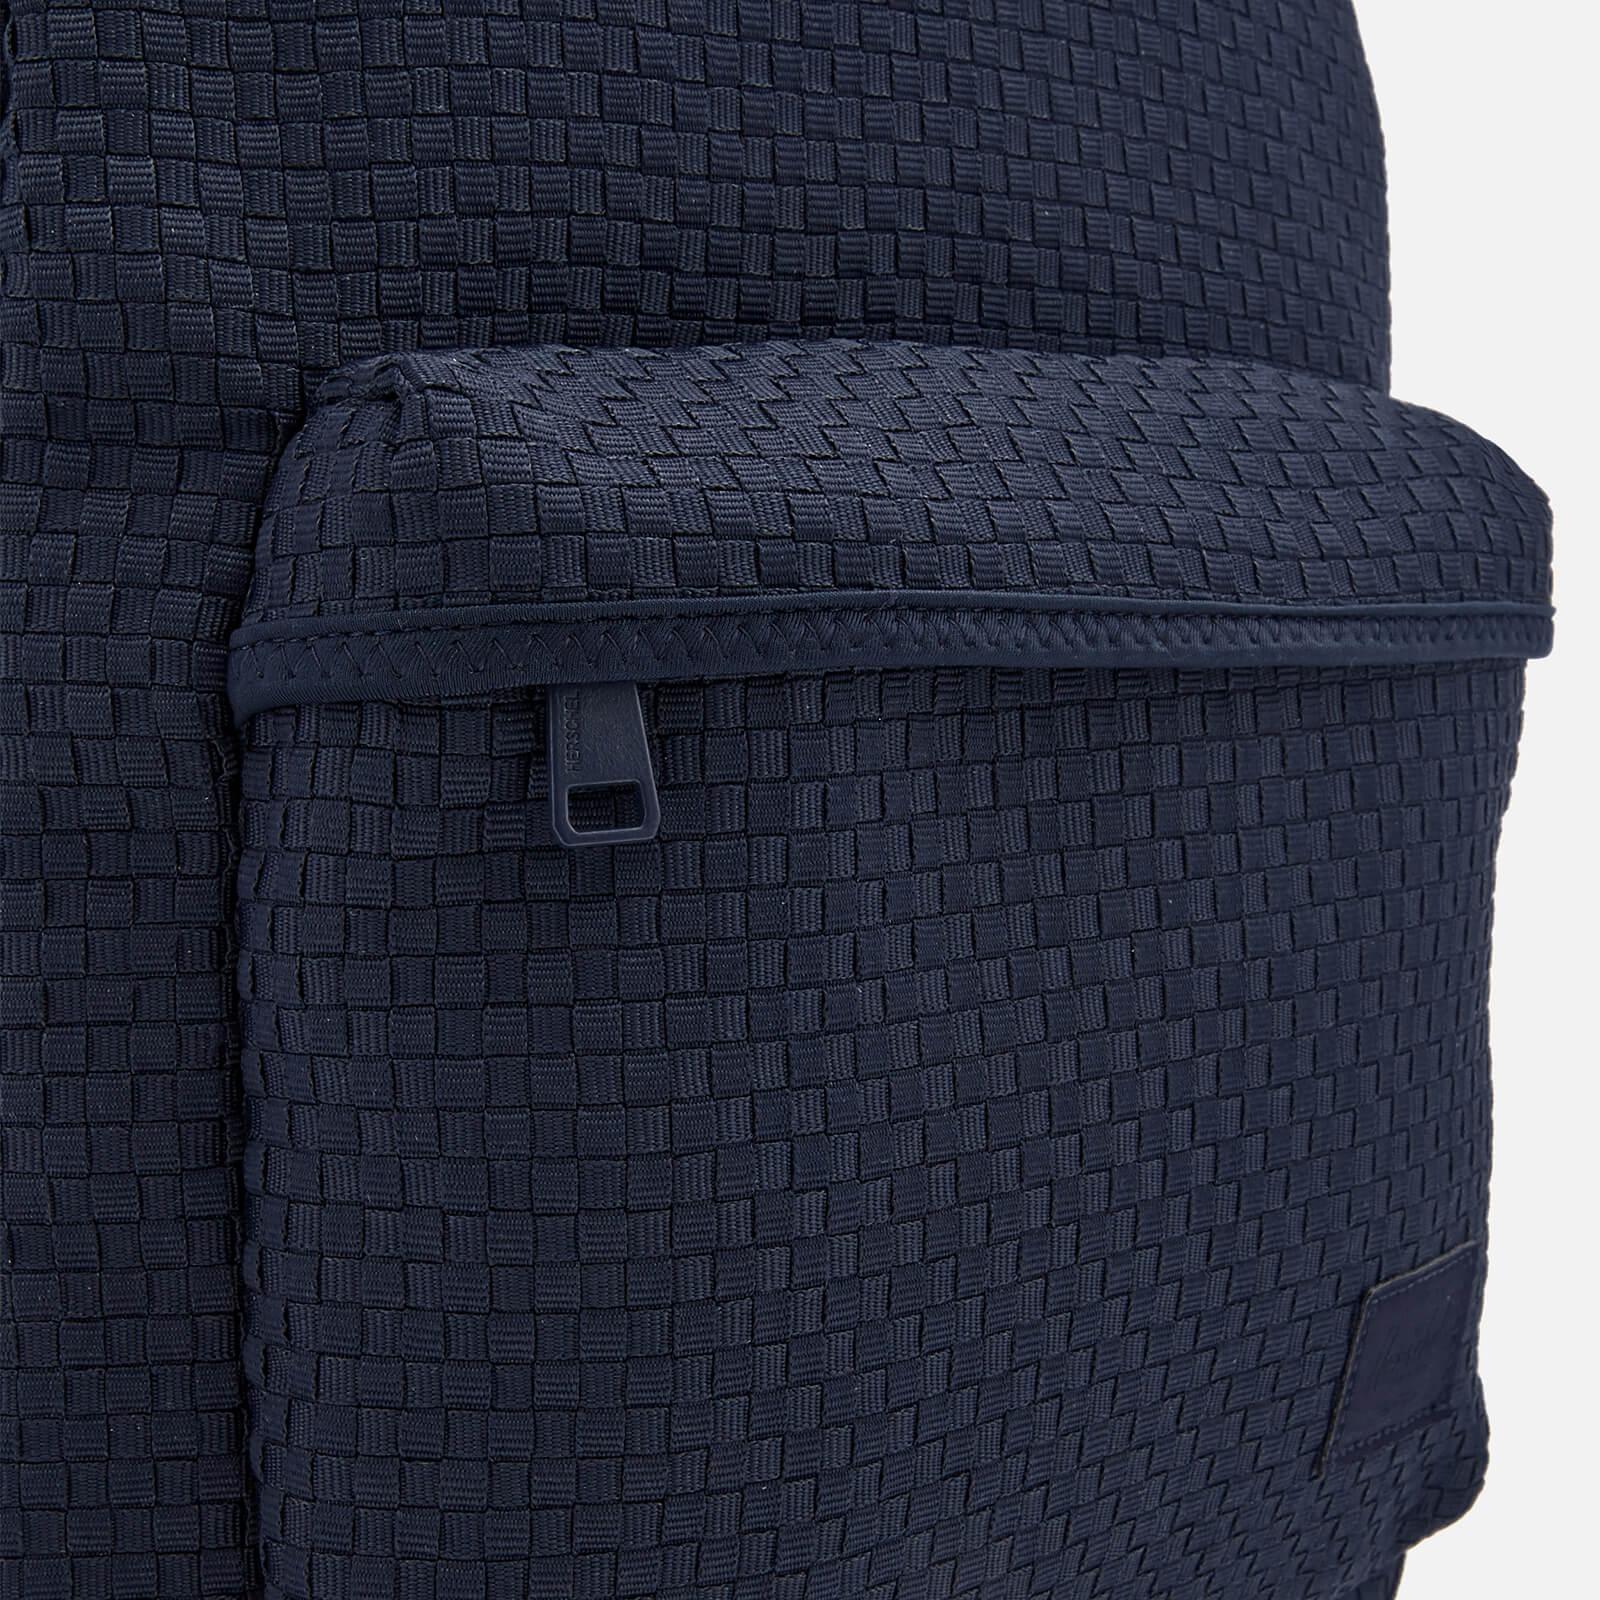 6b6c7546e70 Lyst - Herschel Supply Co. Woven Lawson Backpack in Blue for Men